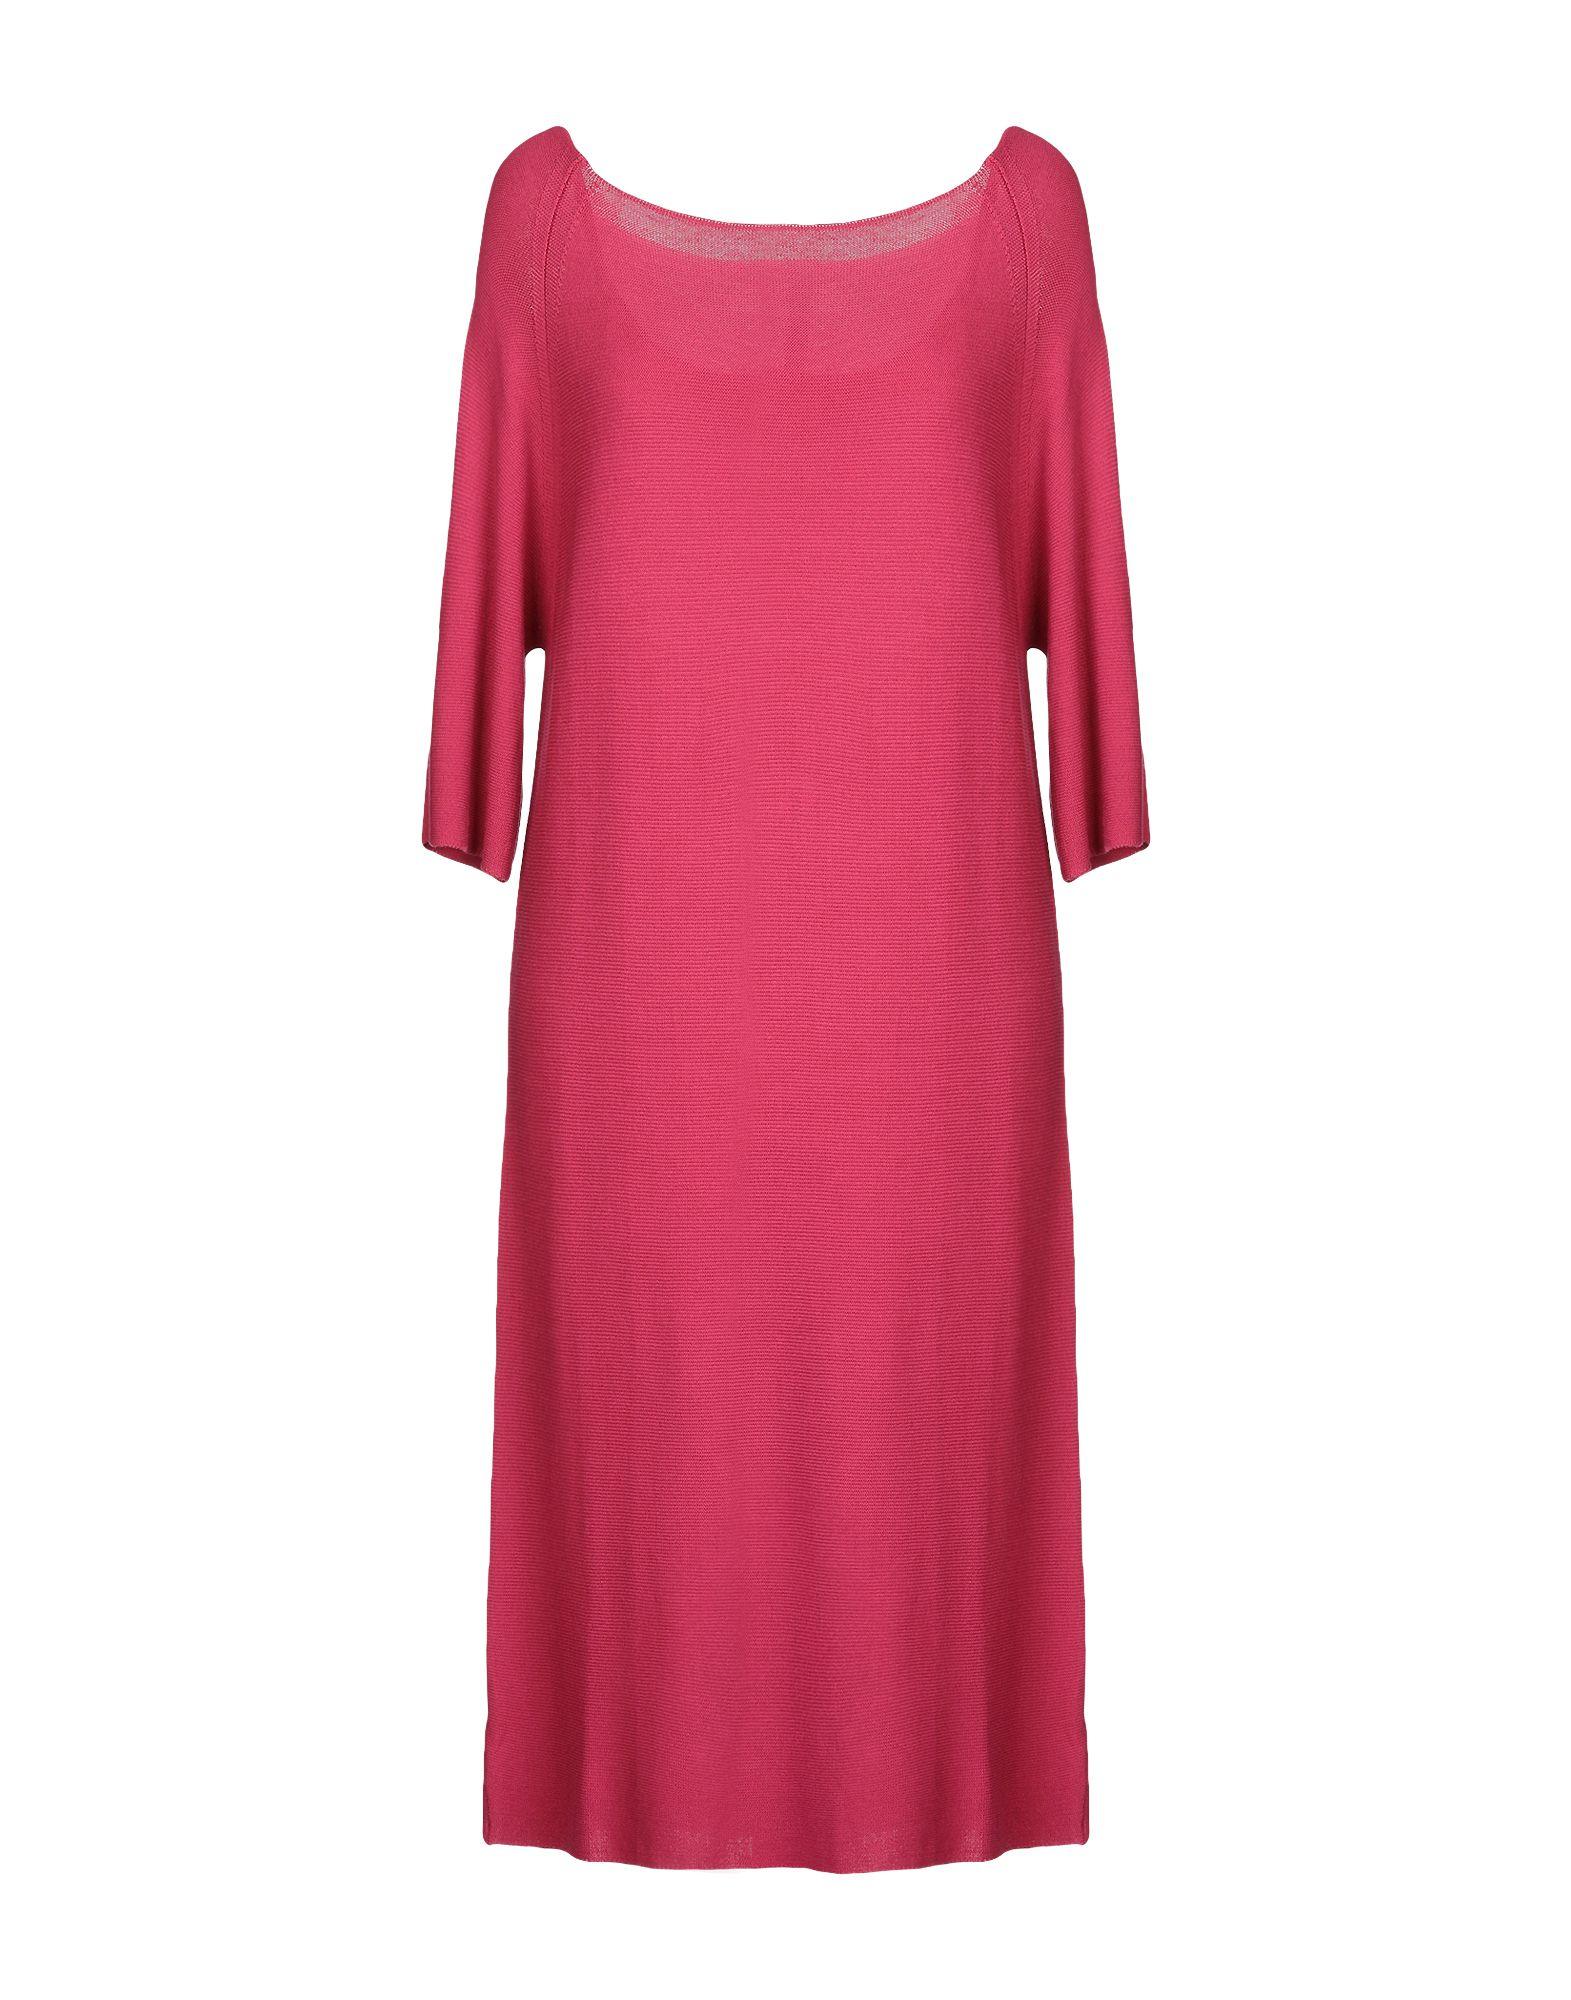 CRISTINA GAVIOLI Платье до колена платье cristina gavioli цвет зеленый